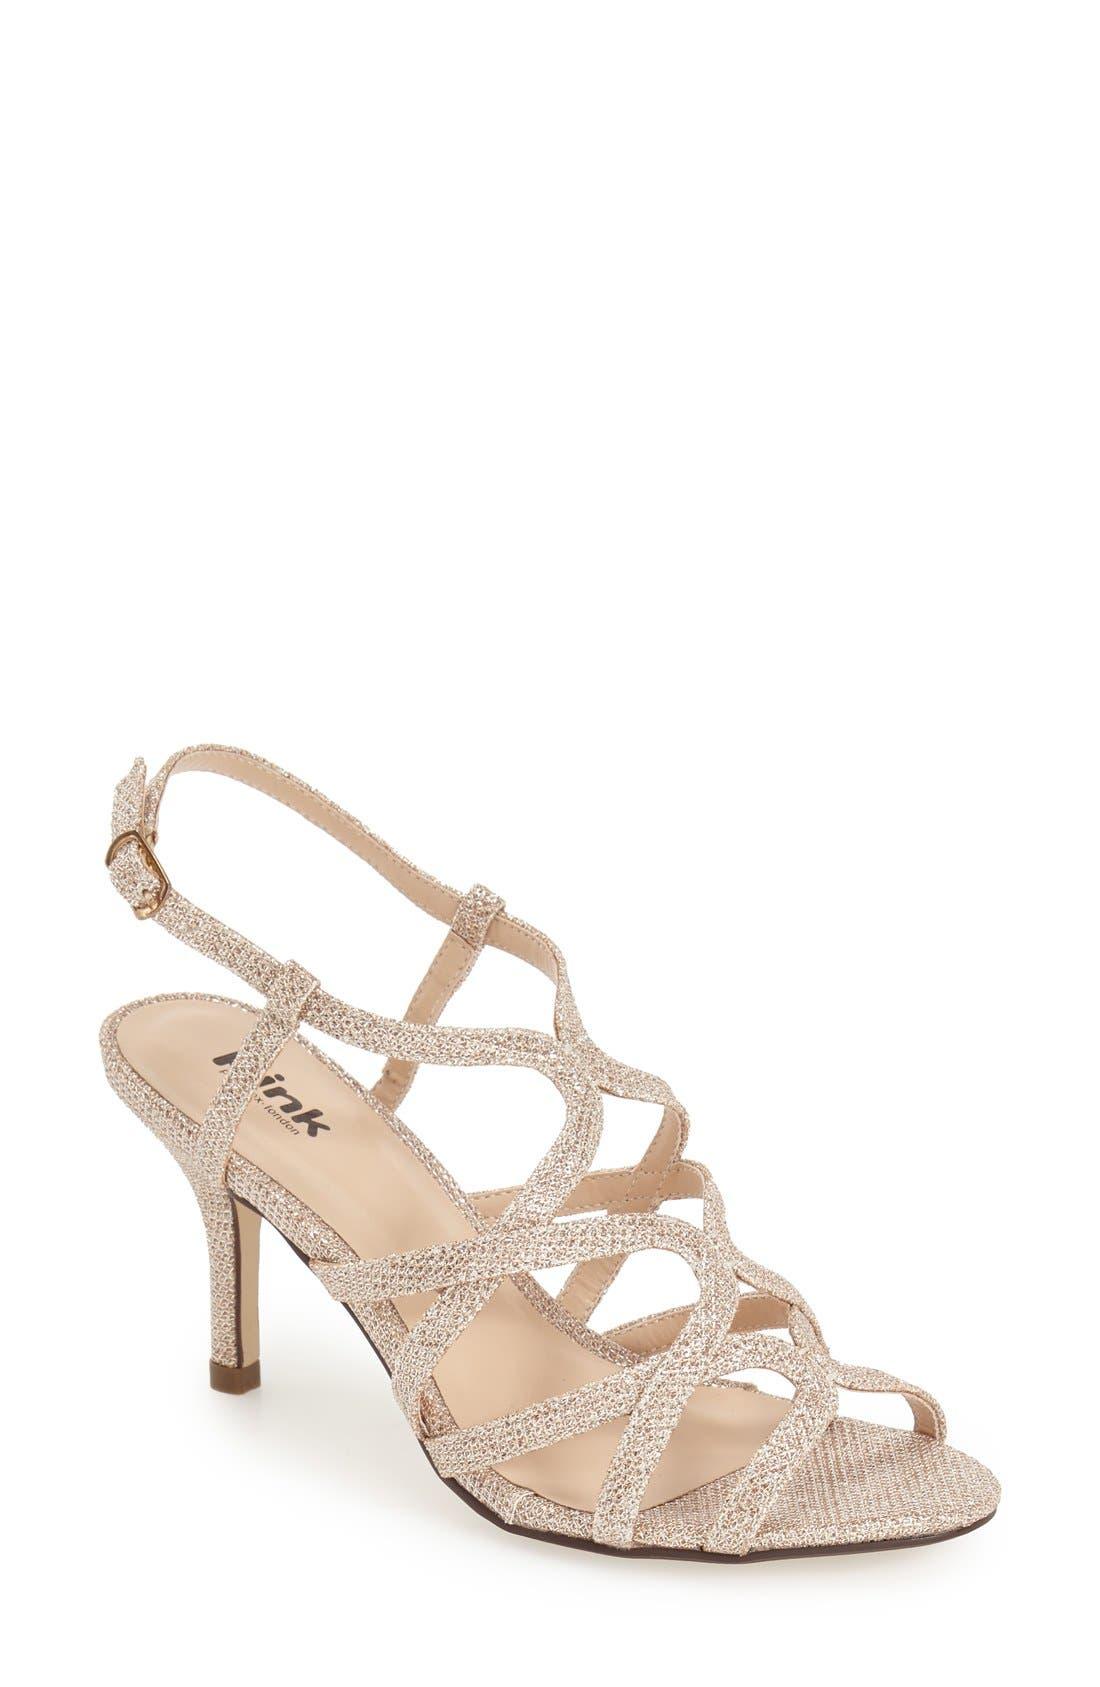 'Rich Glitter' Sandal,                         Main,                         color, CHAMPAGNE GLITTER MESH